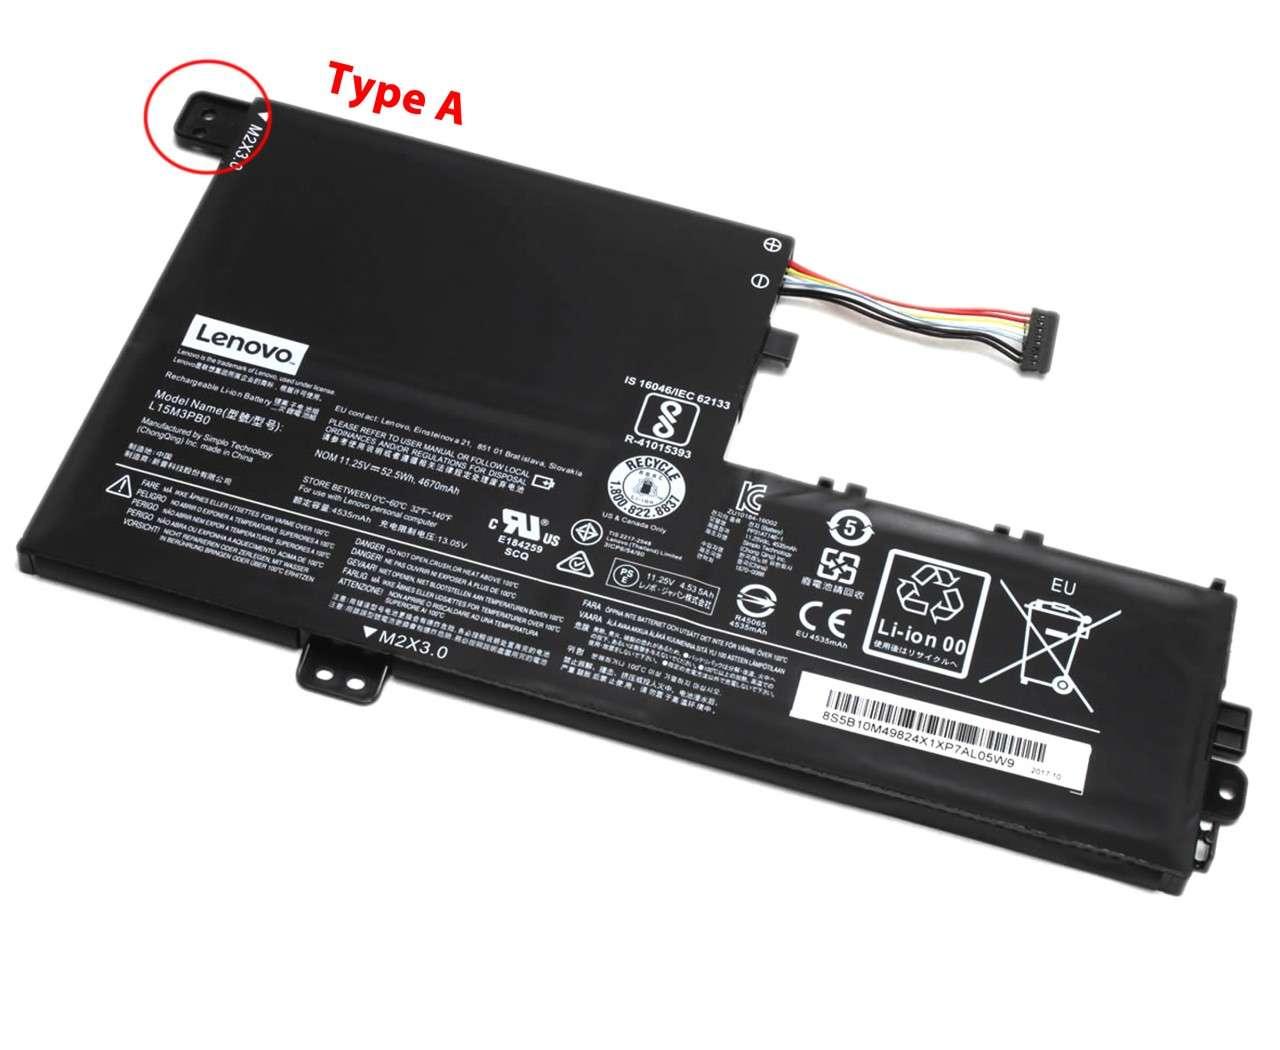 Baterie Lenovo IdeaPad 320S 15ABR Originala 52.5Wh Type A imagine powerlaptop.ro 2021